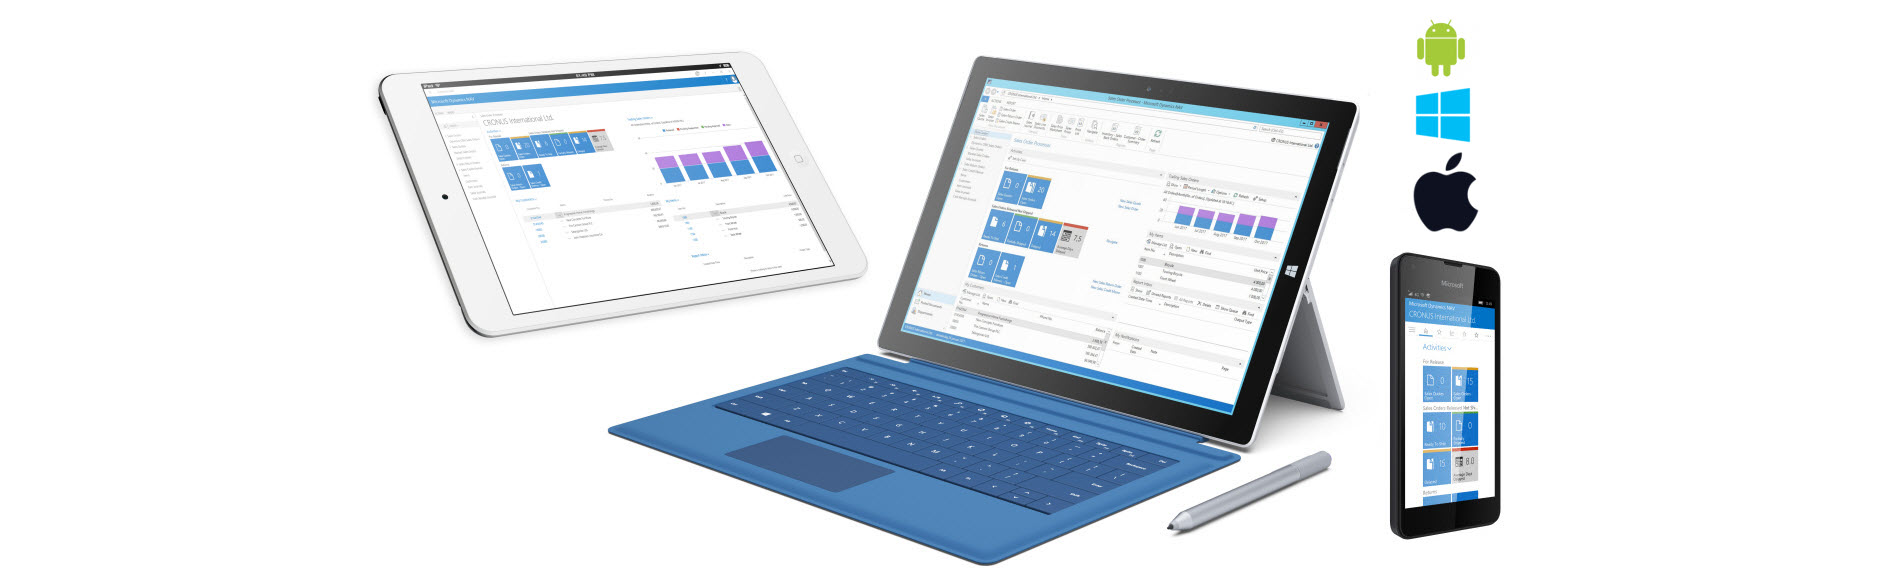 Dynamics NAV 2016 - Mobilite - Tablet - Smartphone